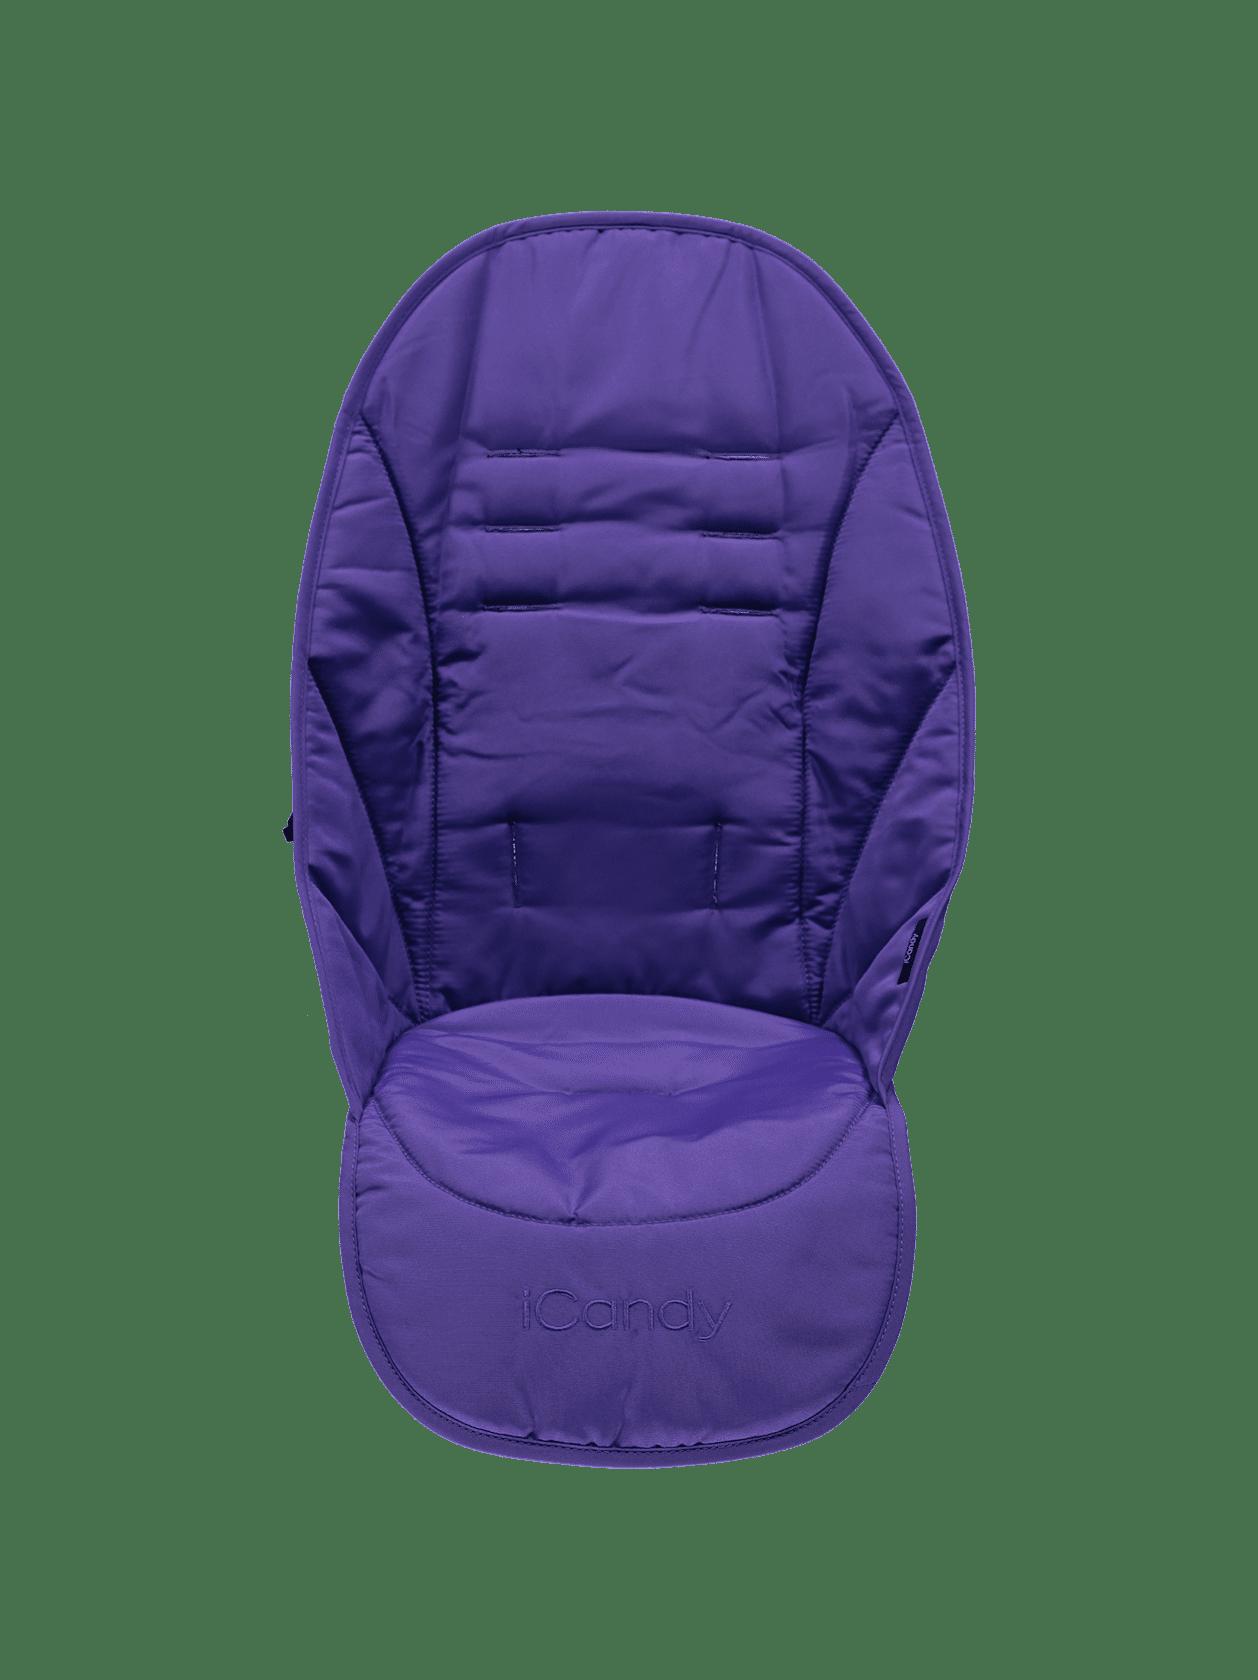 Strawberry2 Seat Liner - Prism